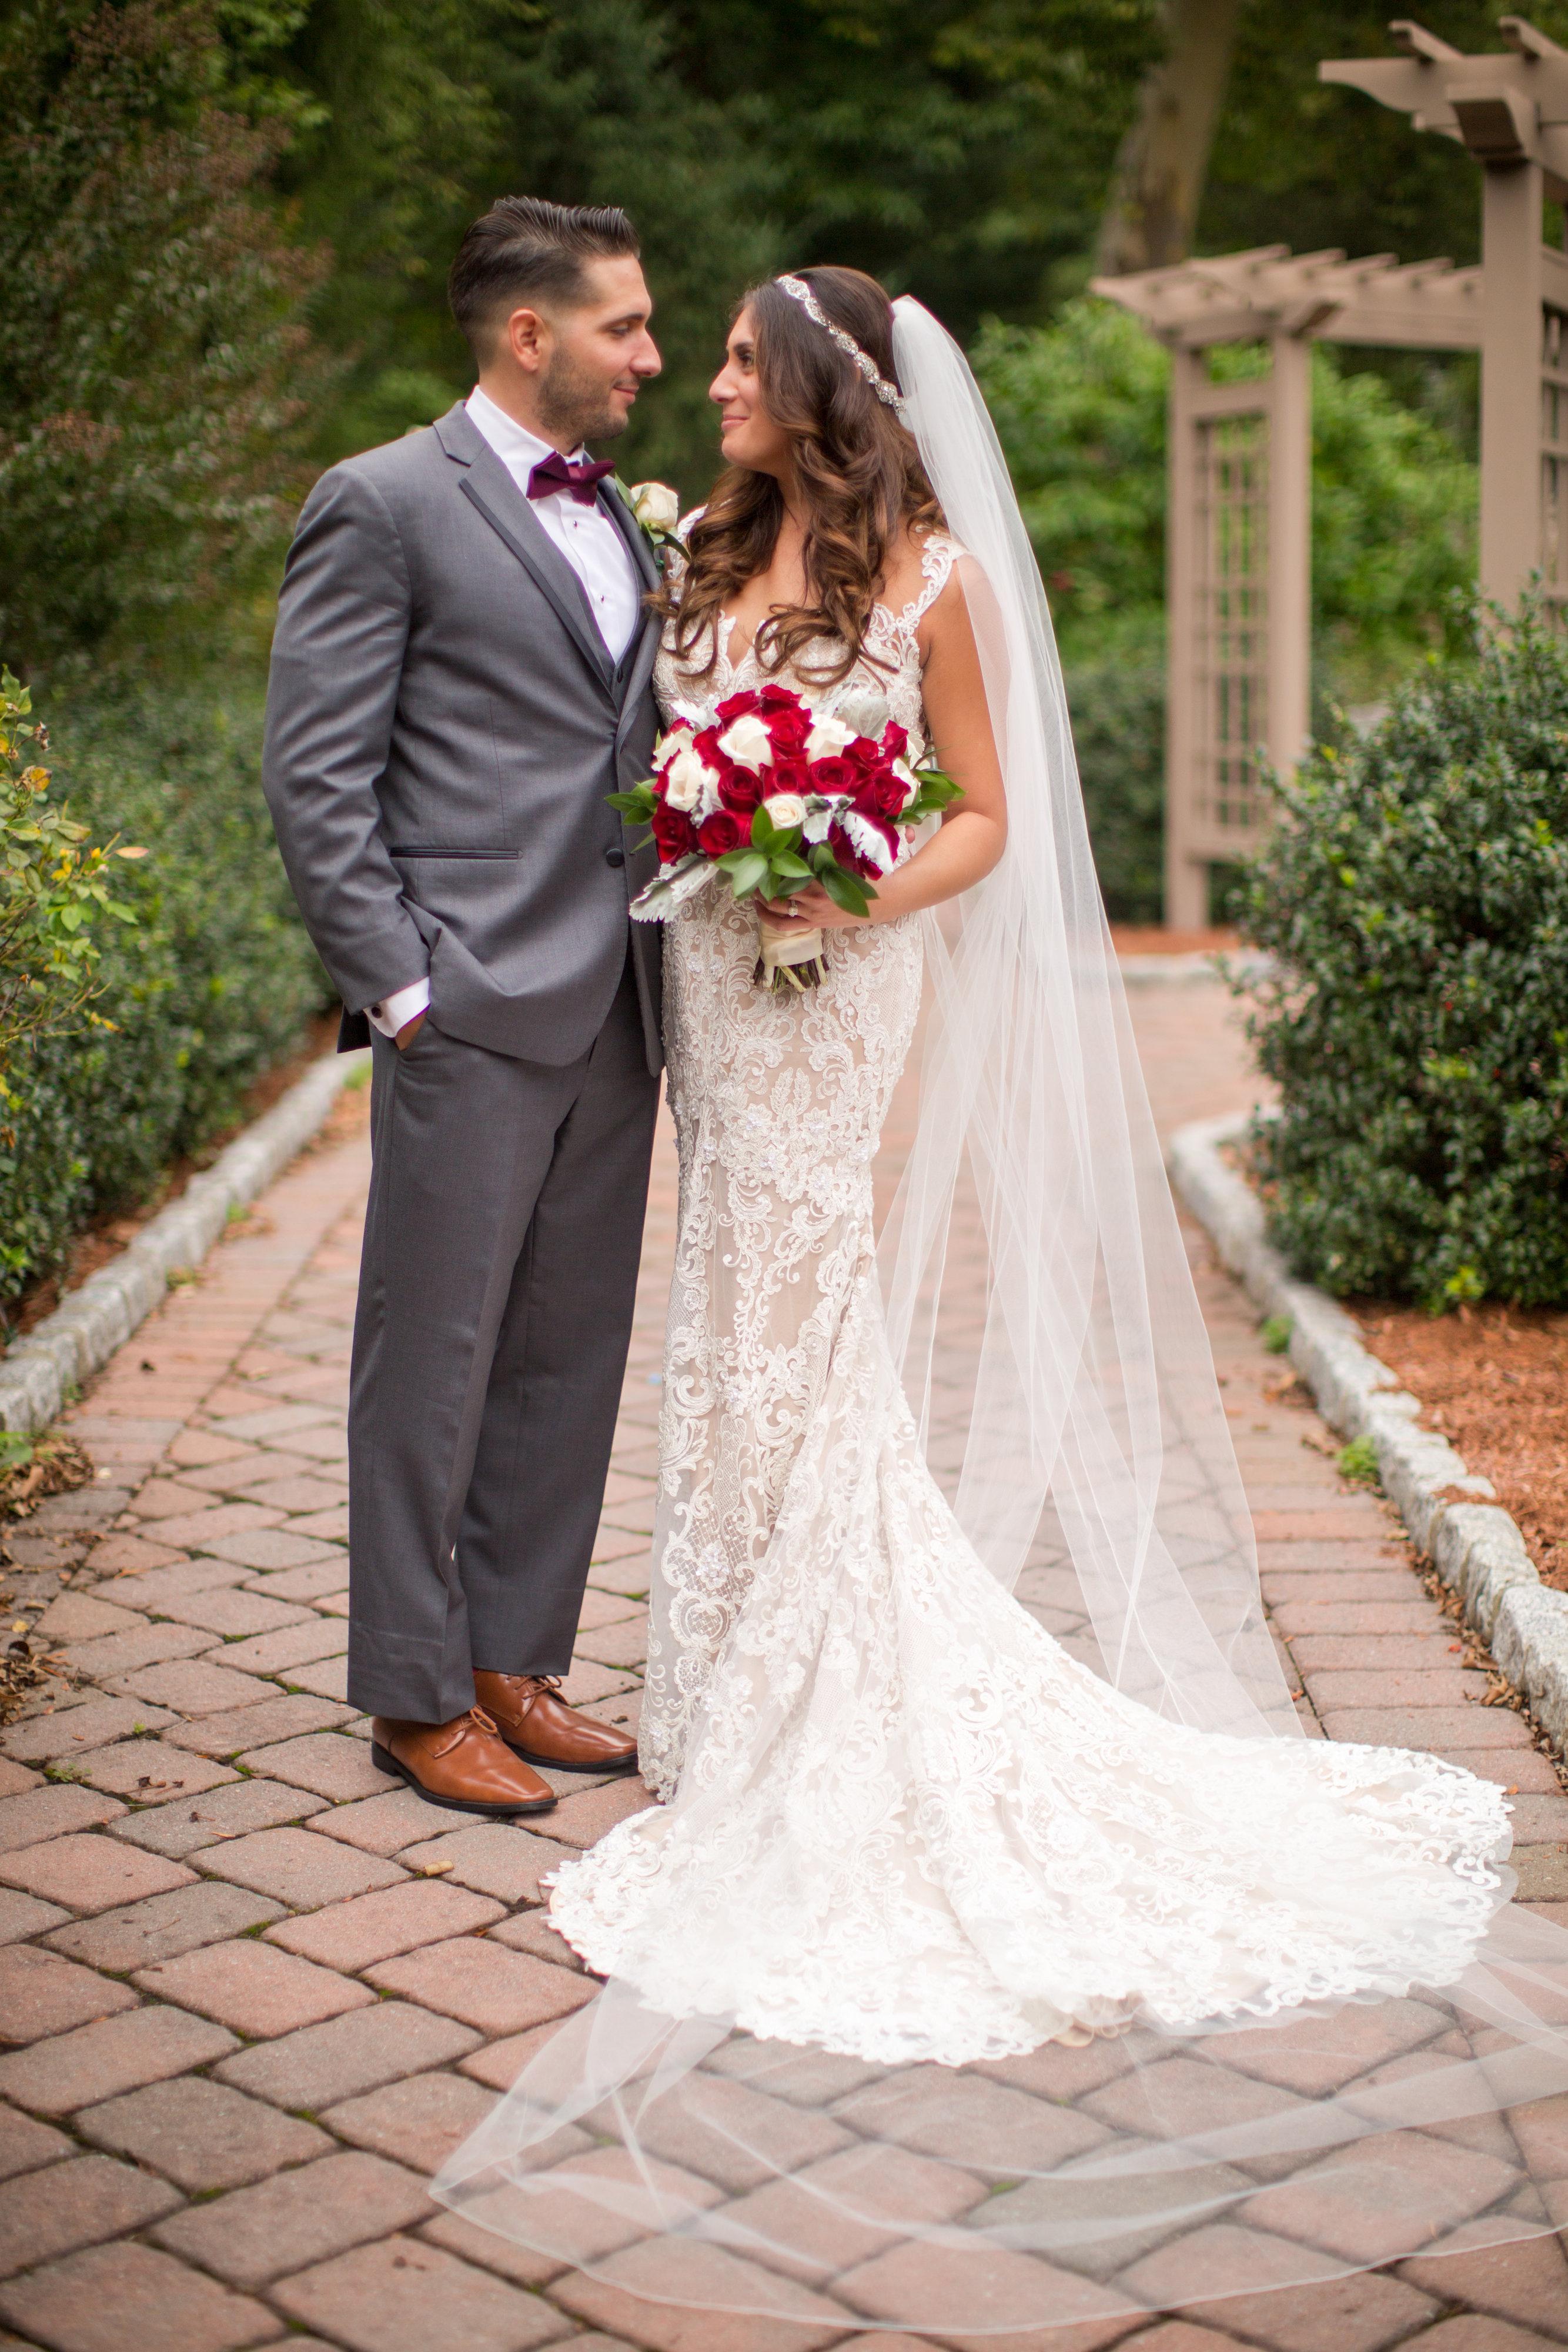 Victoria Caputo Wedding – The Millennial Mirror